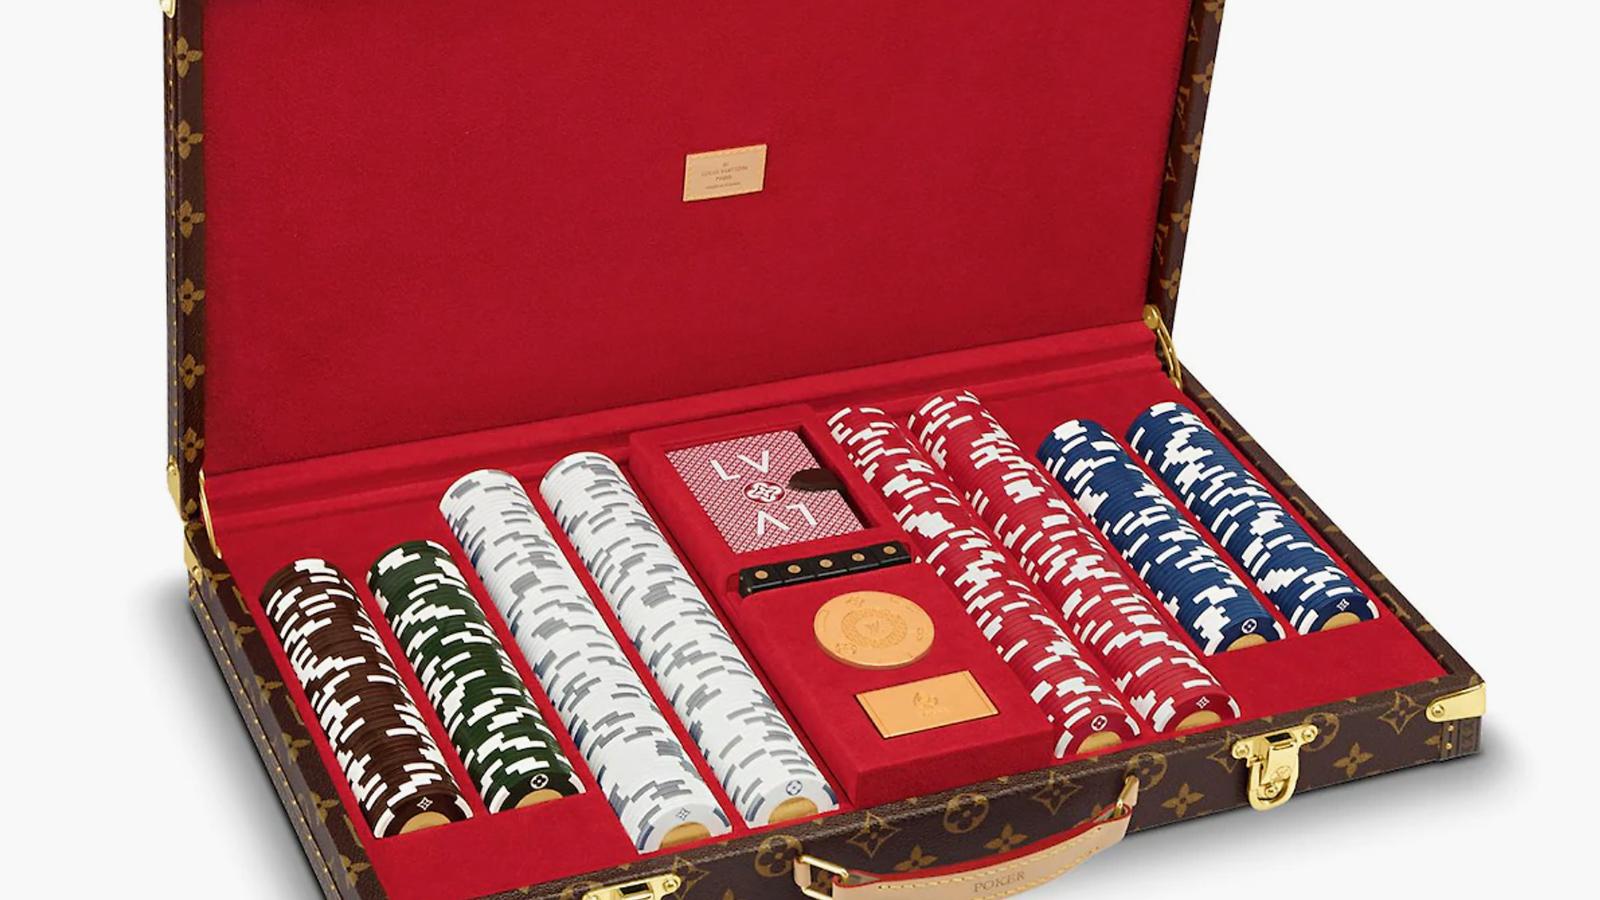 Louis Vuitton Poker Case